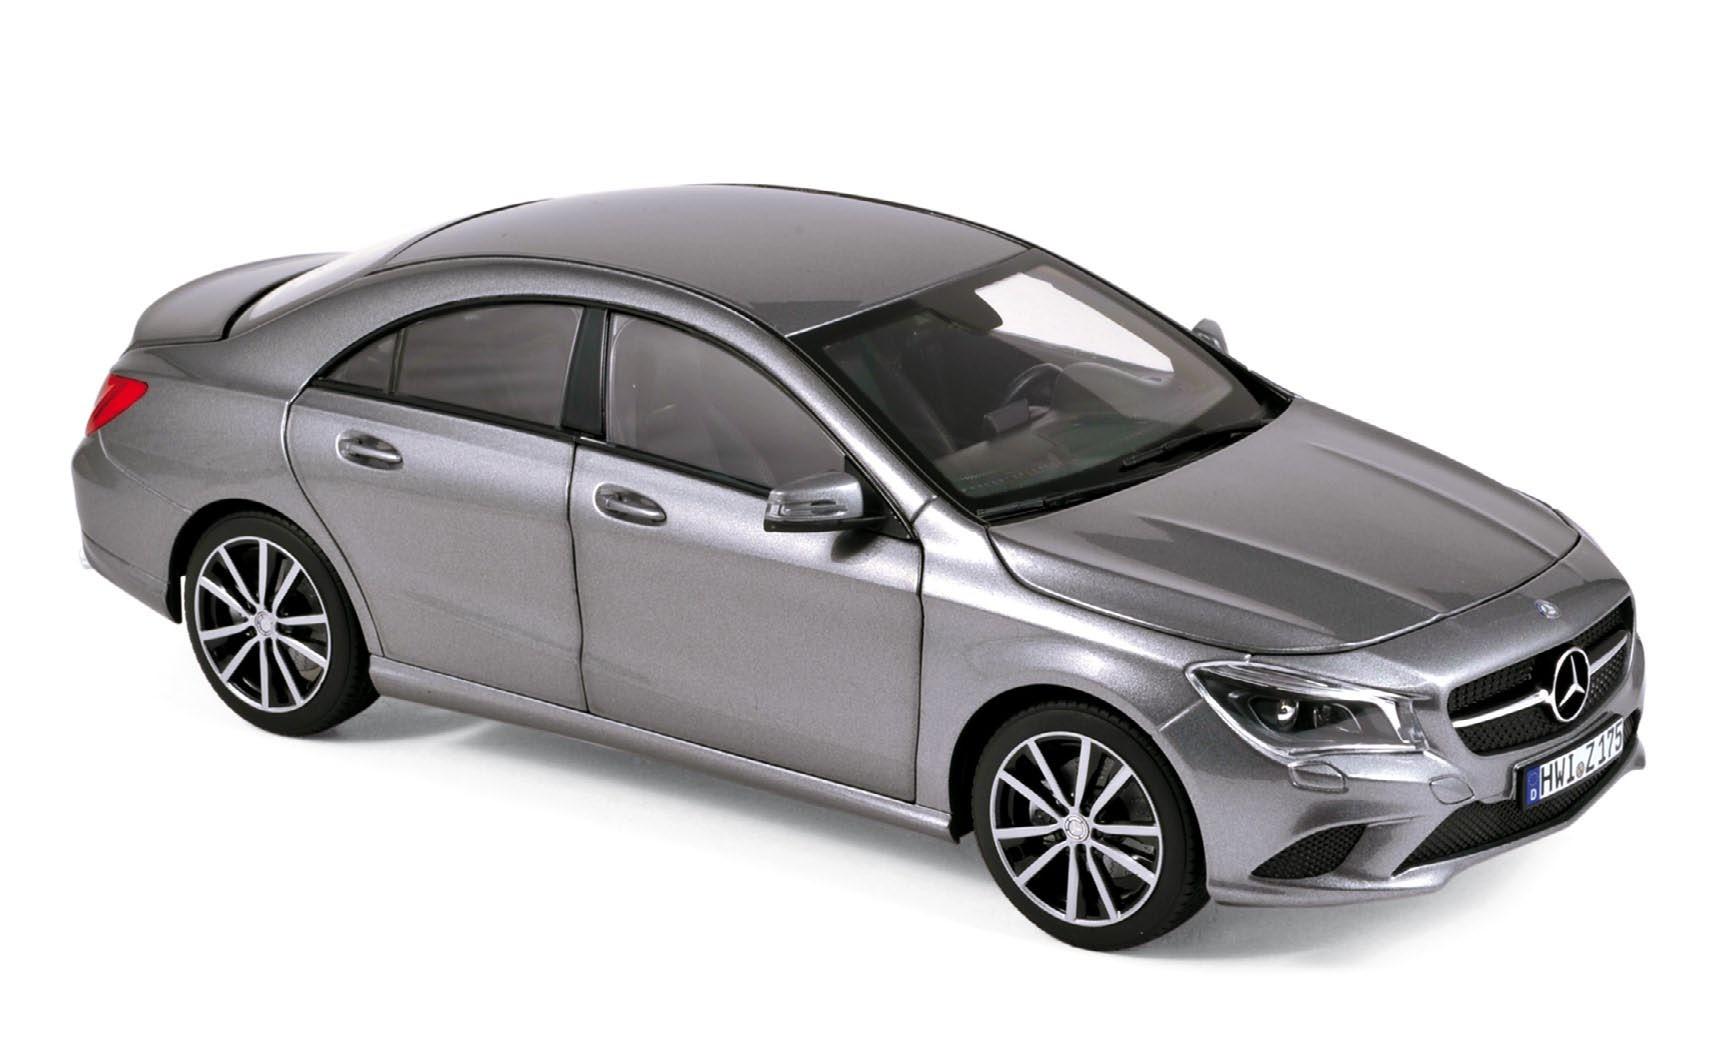 Mercedes benz cla class 2013 grey metallic for 2013 cla mercedes benz